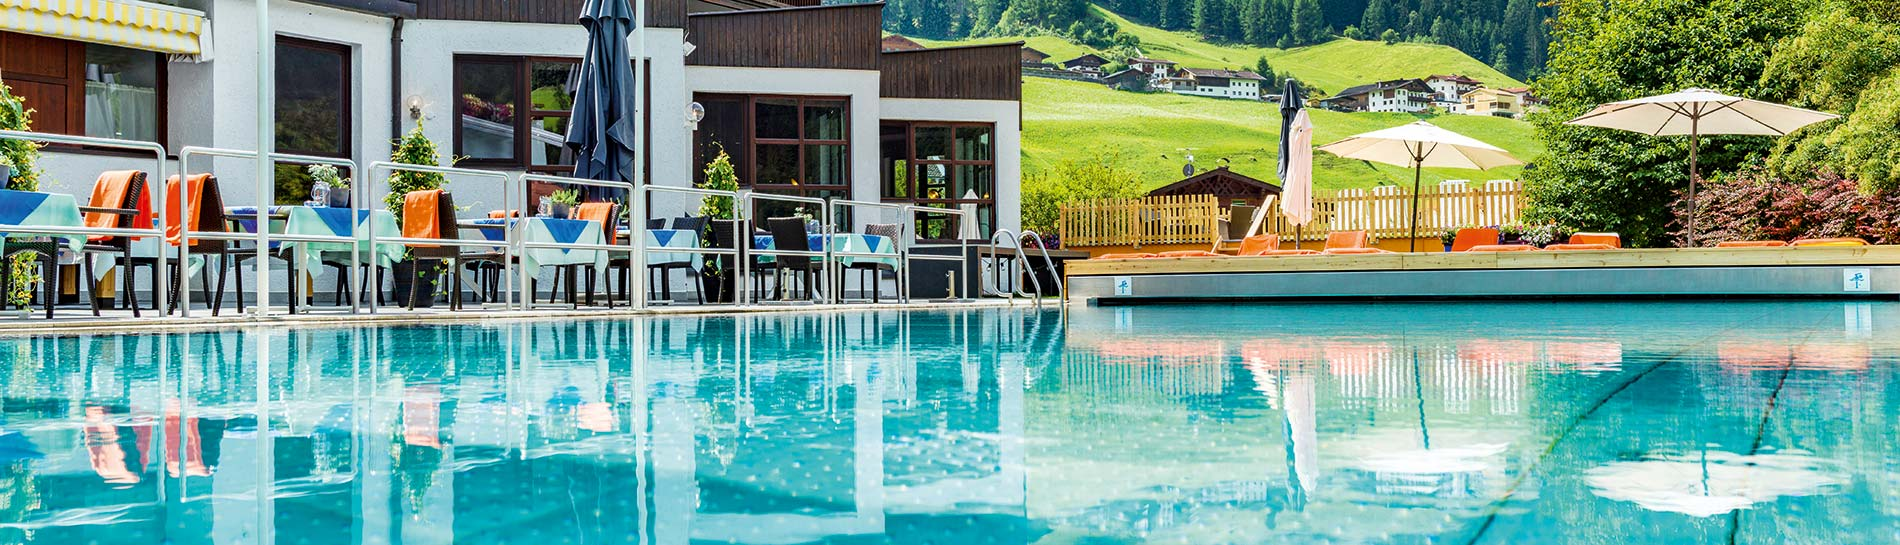 Happy Stubai Hostel Tyrol Austria